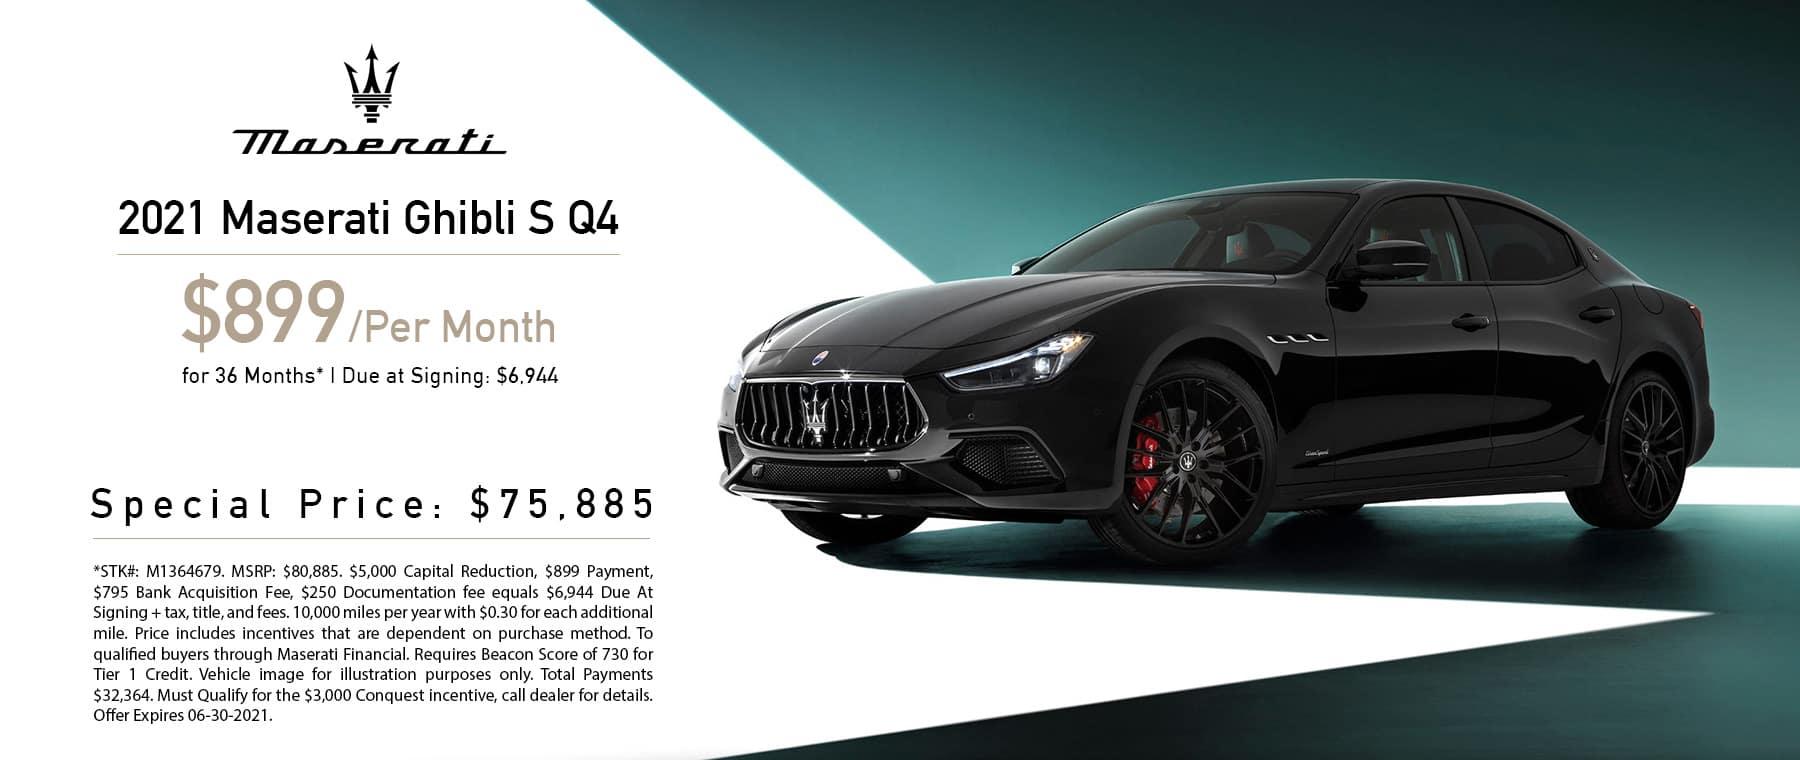 Maserati_2021_Ghibli_Slide_June2021_1